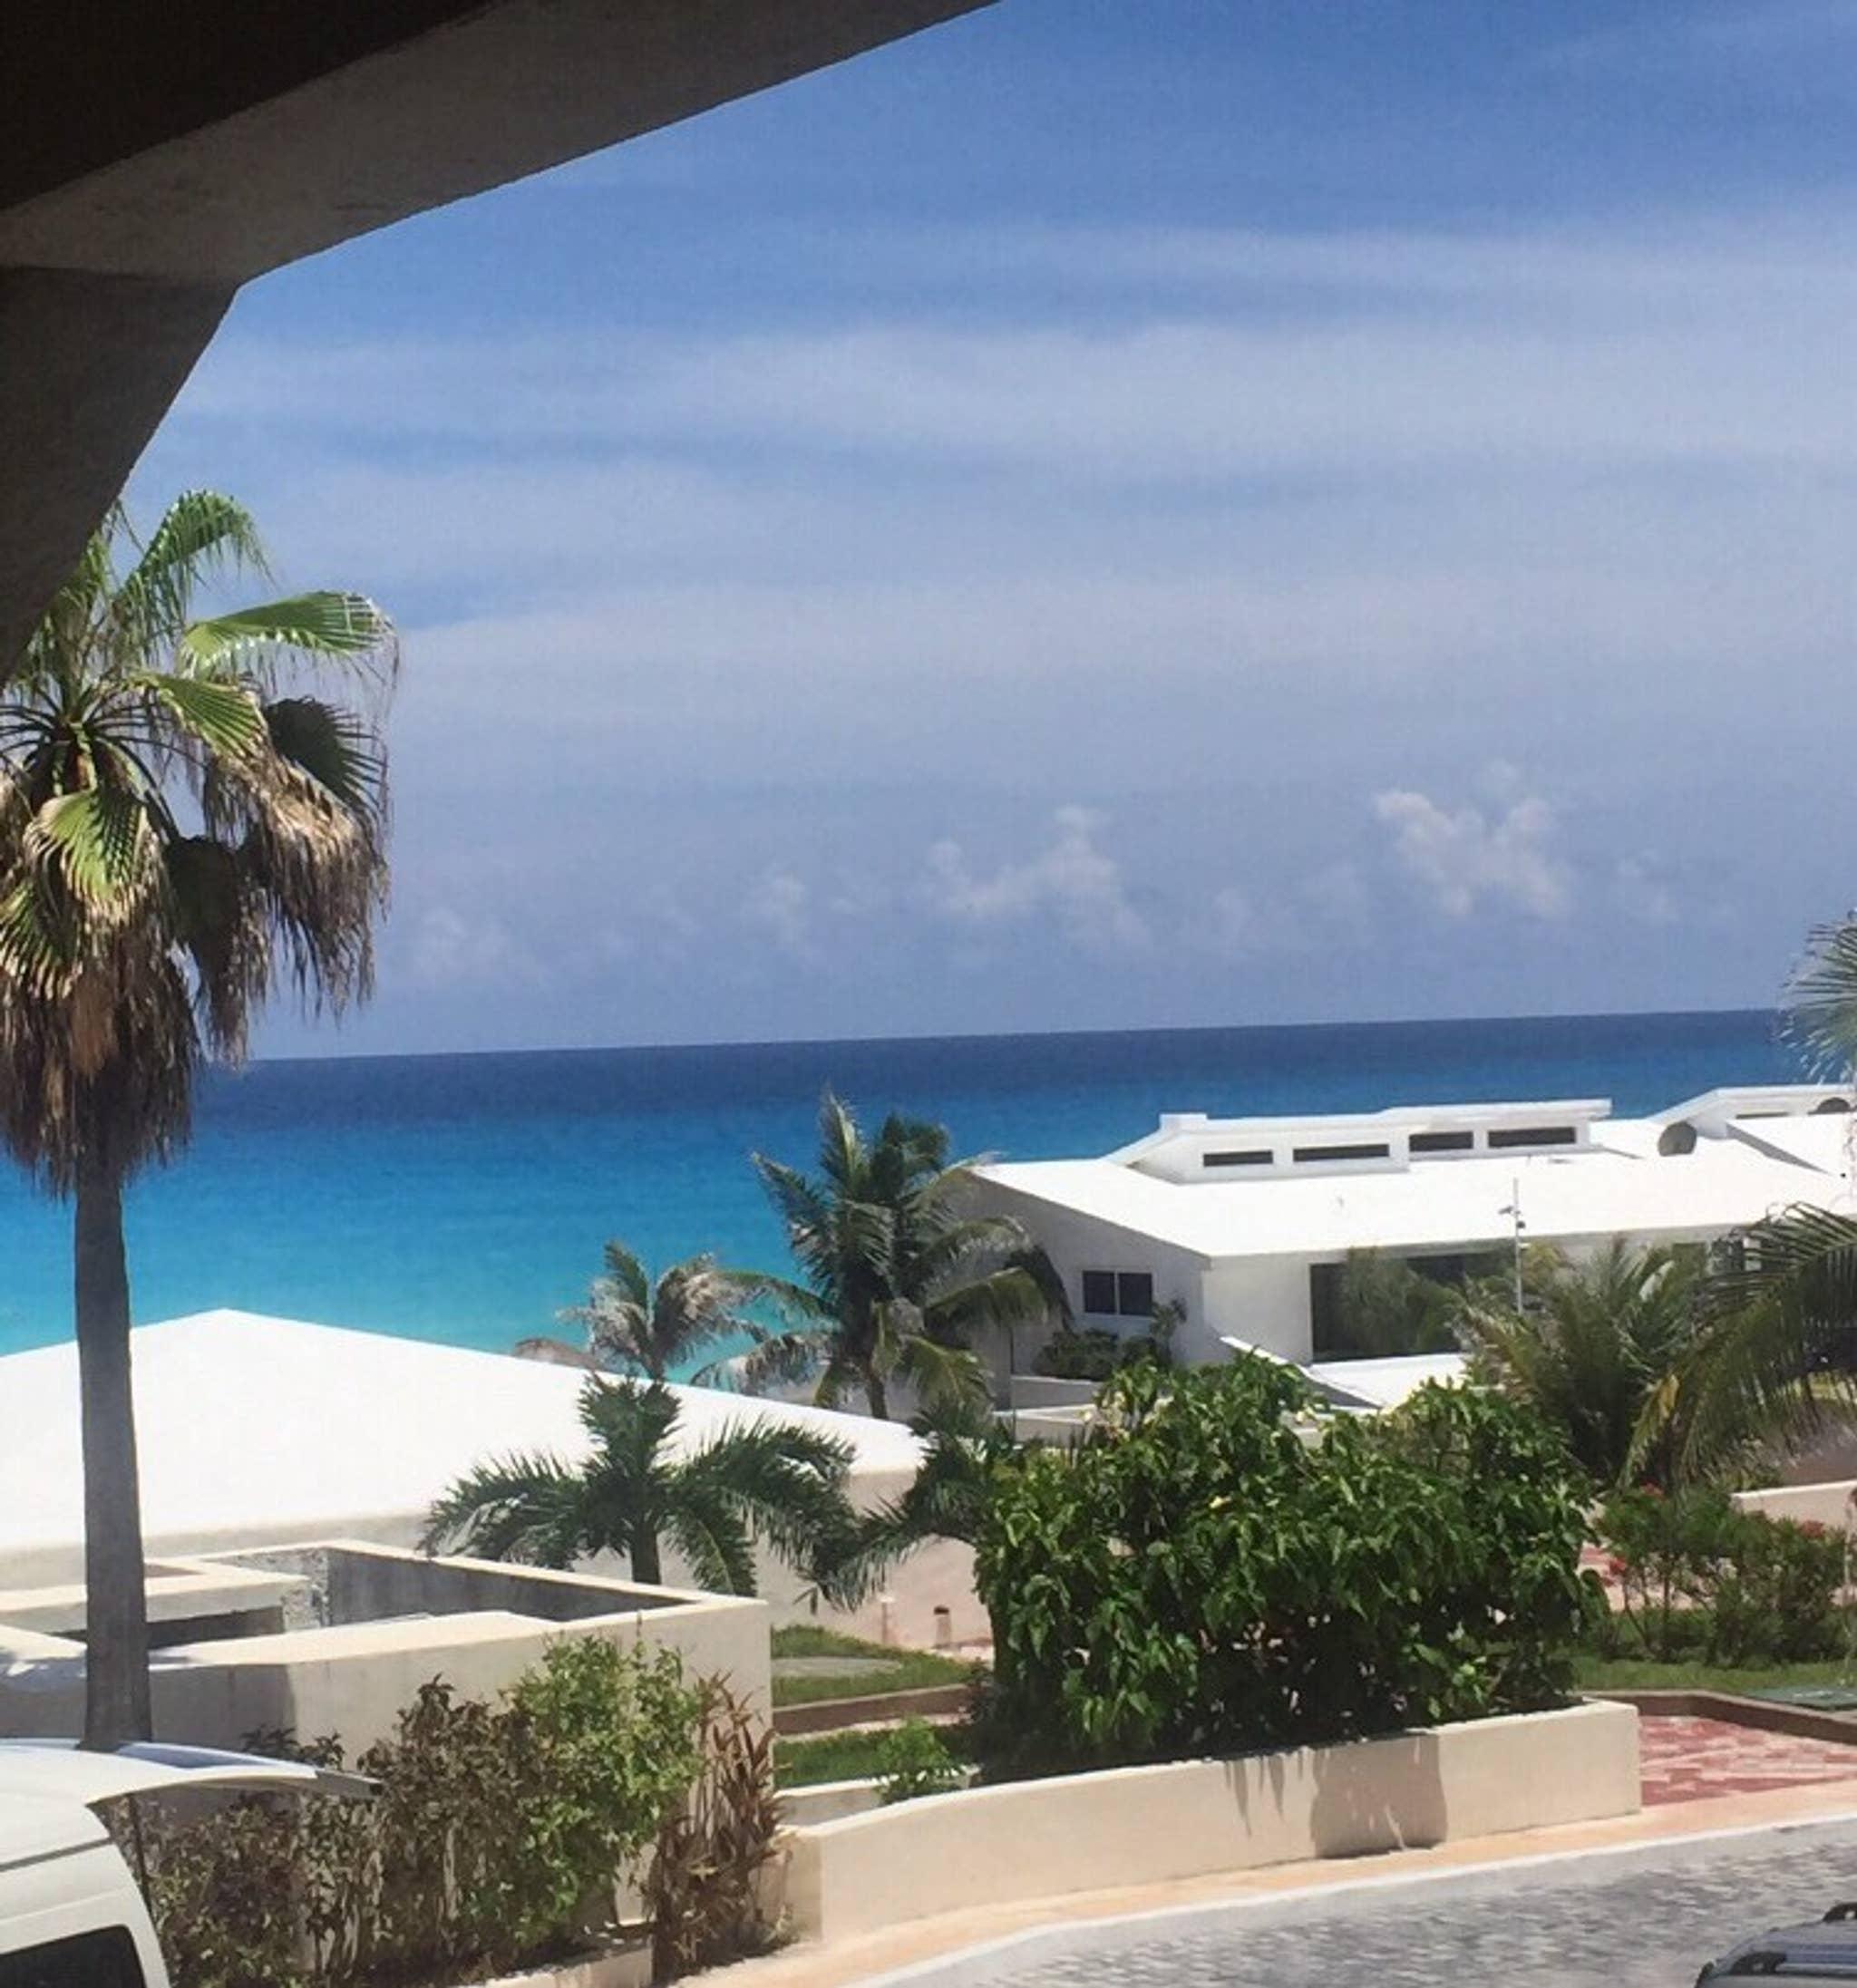 Wunderbare Hotelzone Suite in Cancun